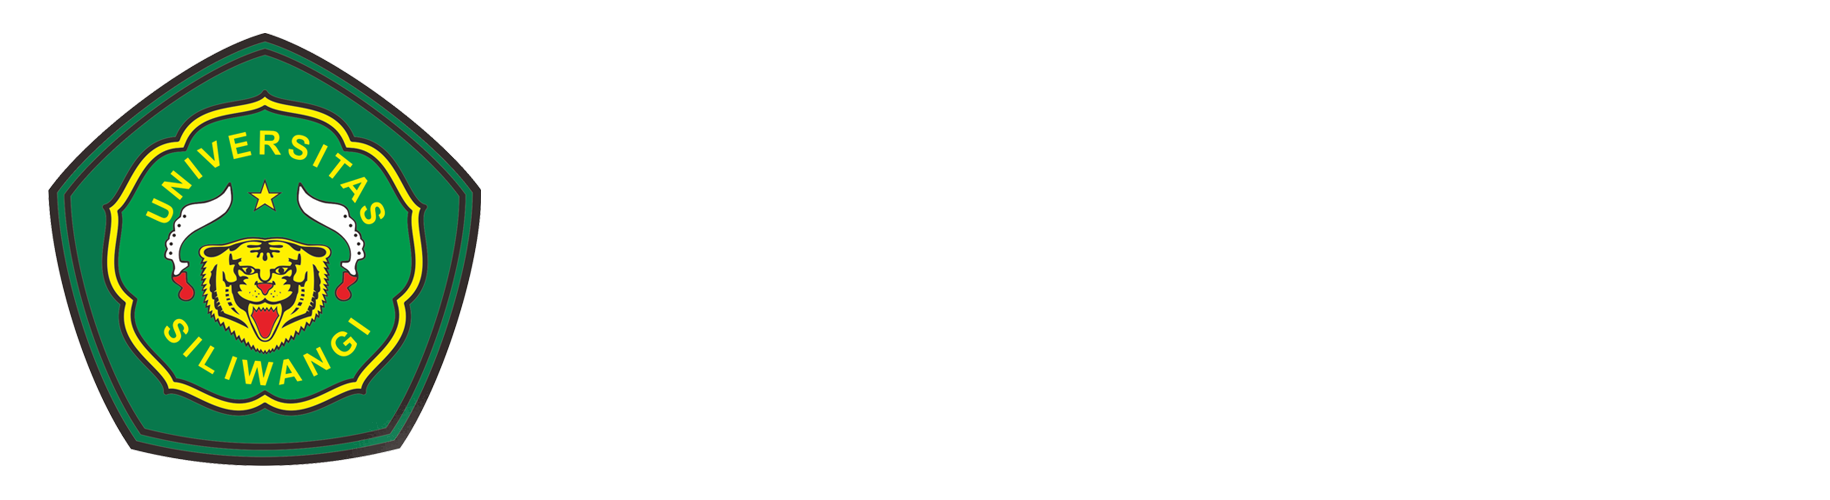 Fakultas Ilmu Sosial dan Ilmu Politik